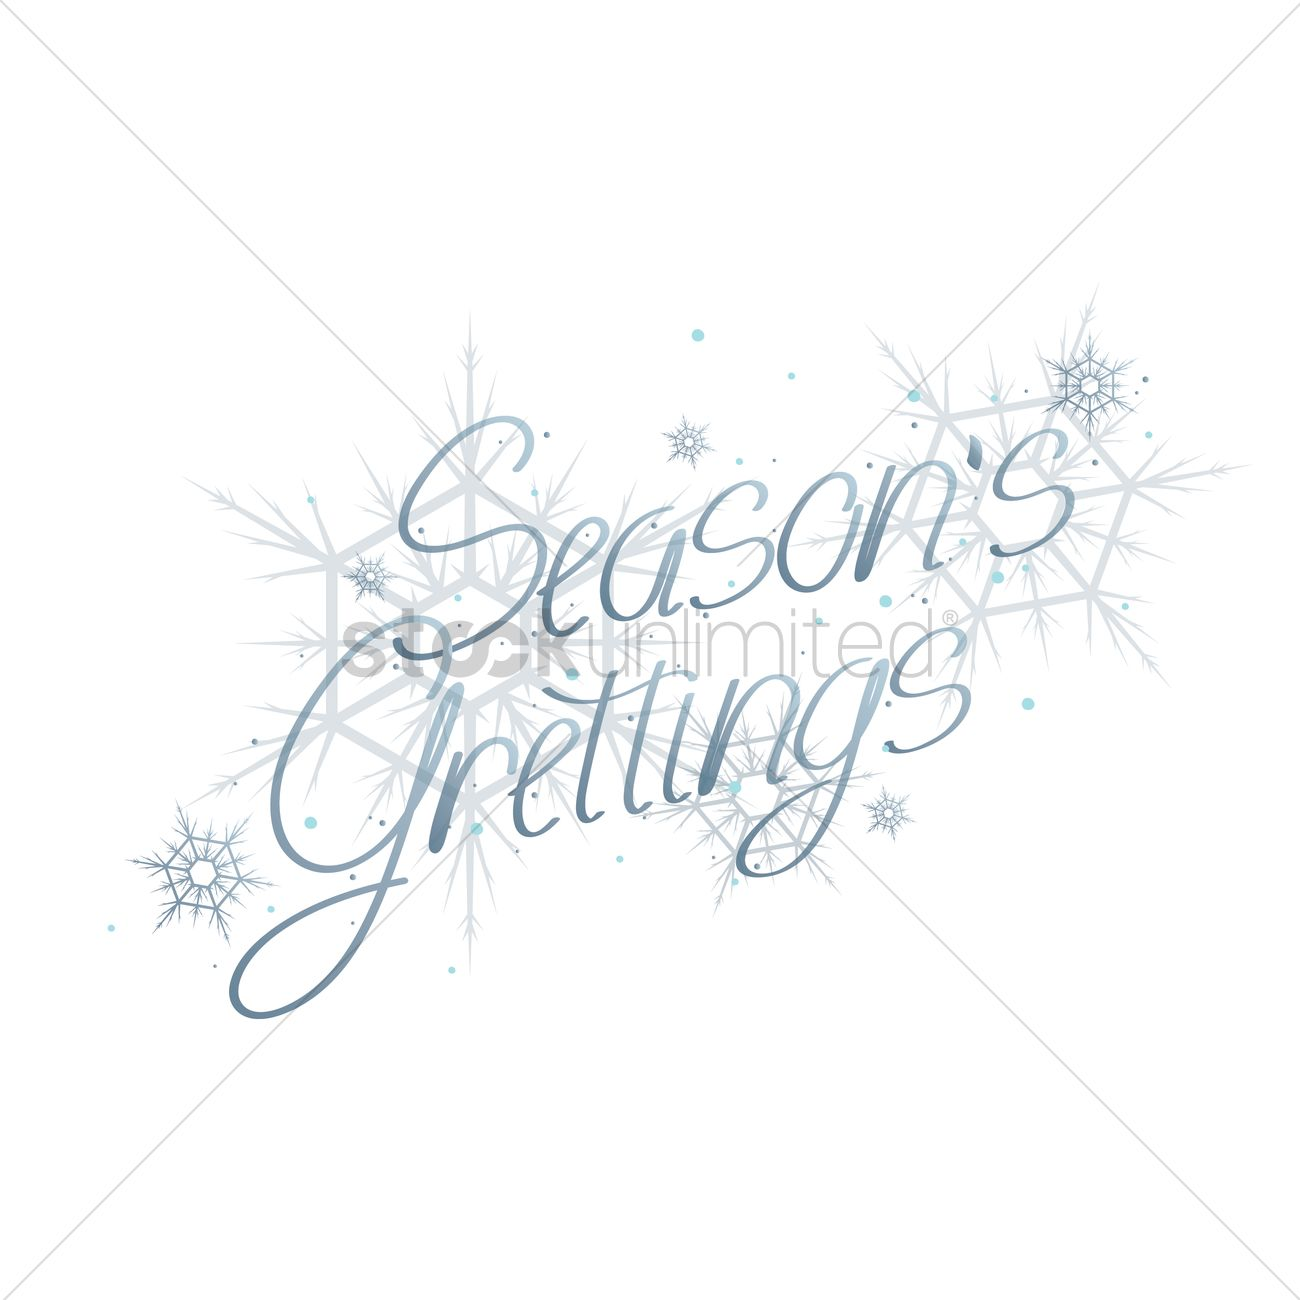 Seasons Greetings Vector Image 1603640 Stockunlimited